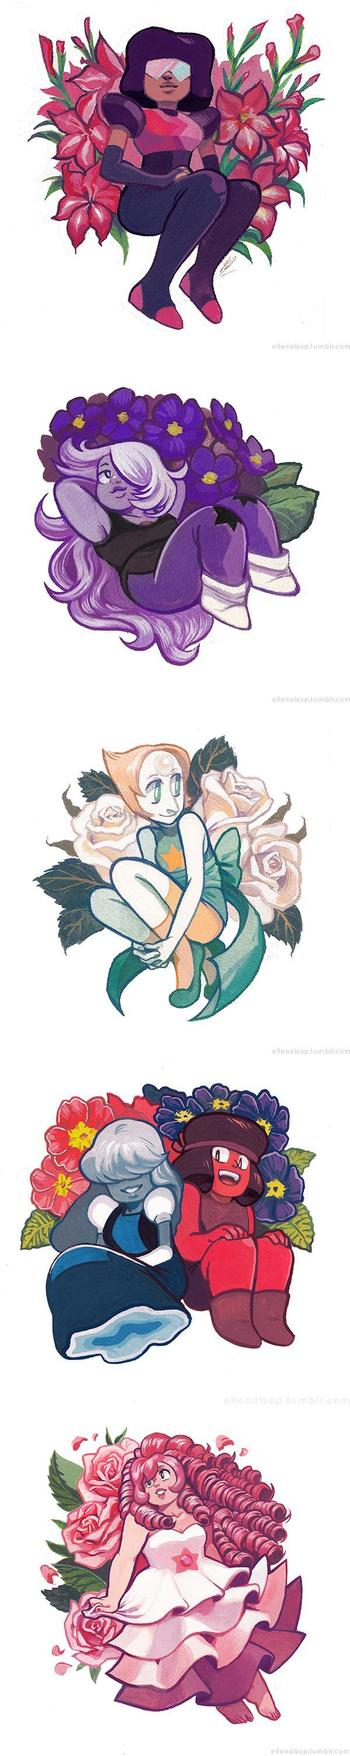 In Bloom - Crystal Gems | Steven Universe